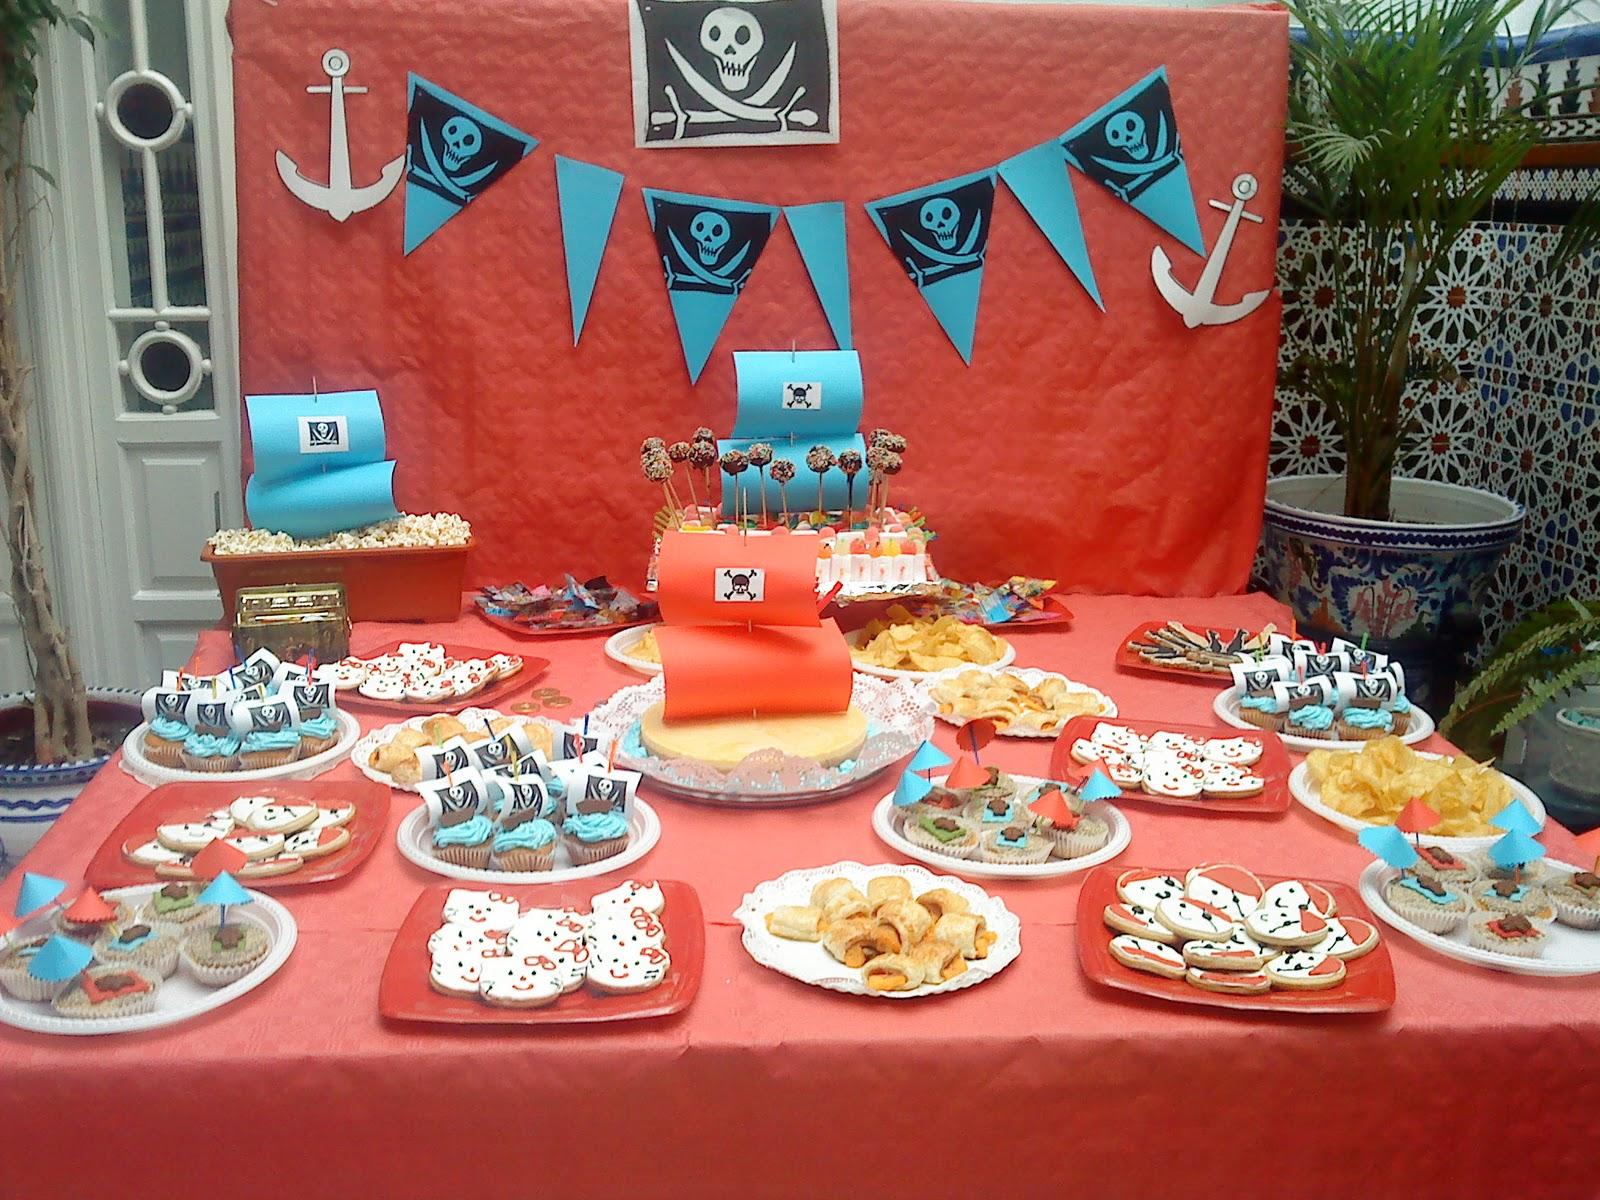 10 de noviembre de 2010 fiesta de cumpleanos pirata esta fiesta de